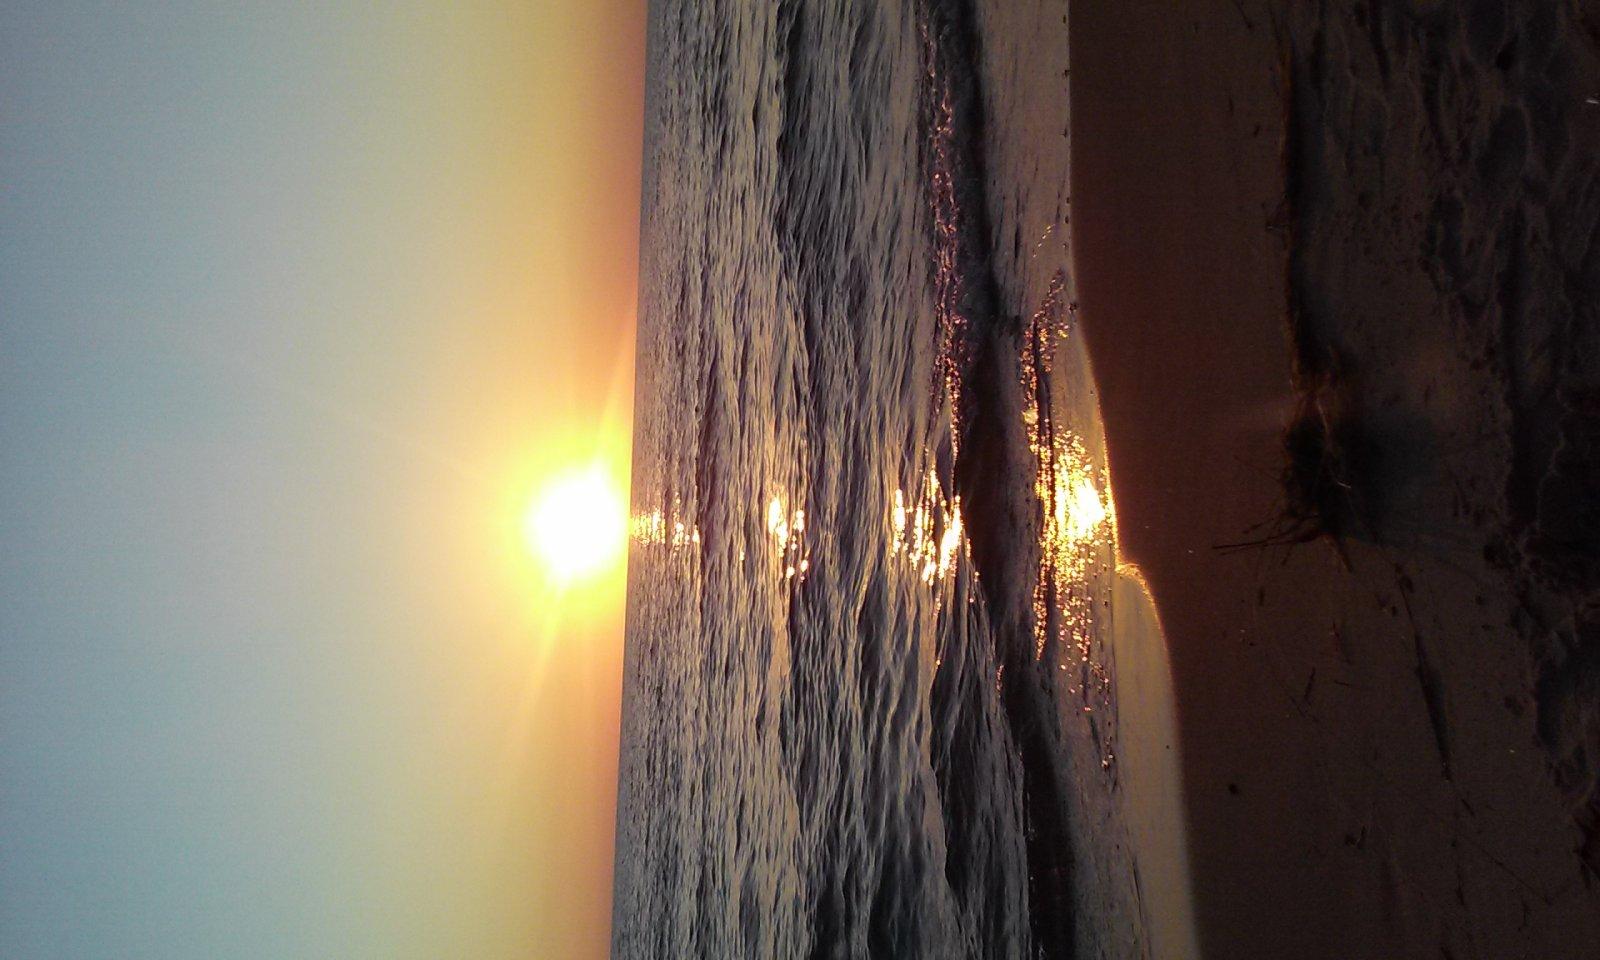 Click image for larger version  Name:Sunset lake MI 2015.jpg Views:128 Size:187.9 KB ID:105302